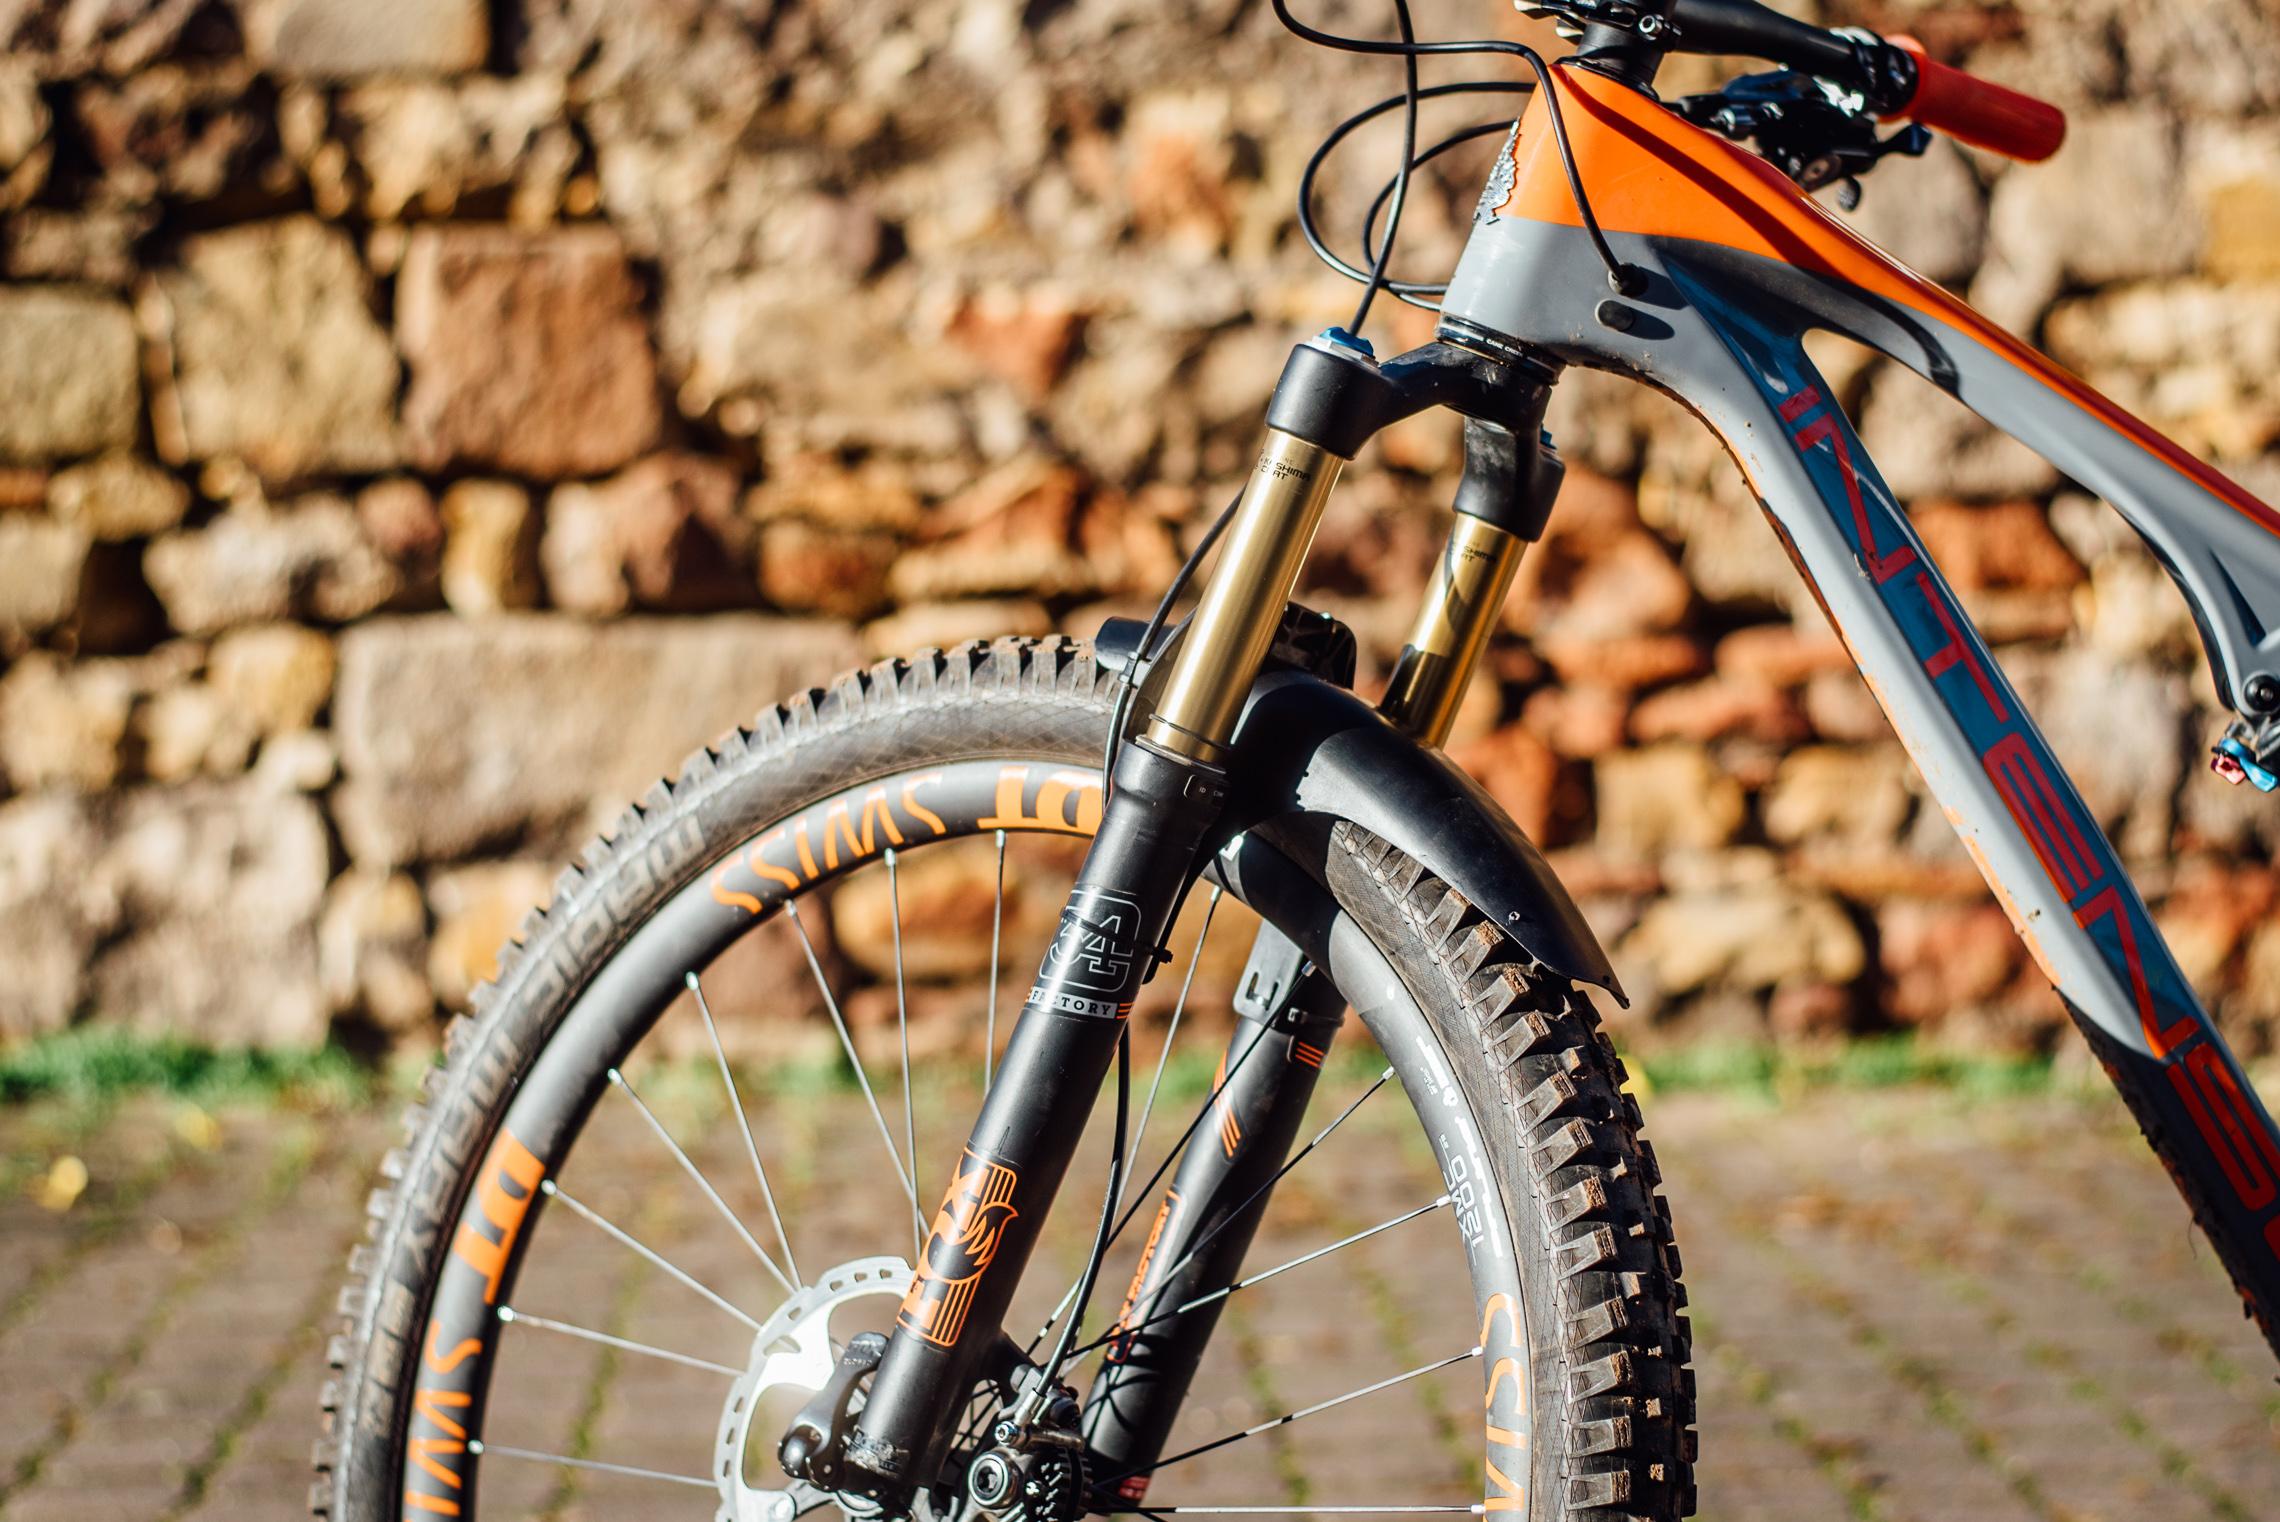 mudhugger mtb vorder schutzblech fur mountain bike mit. Black Bedroom Furniture Sets. Home Design Ideas